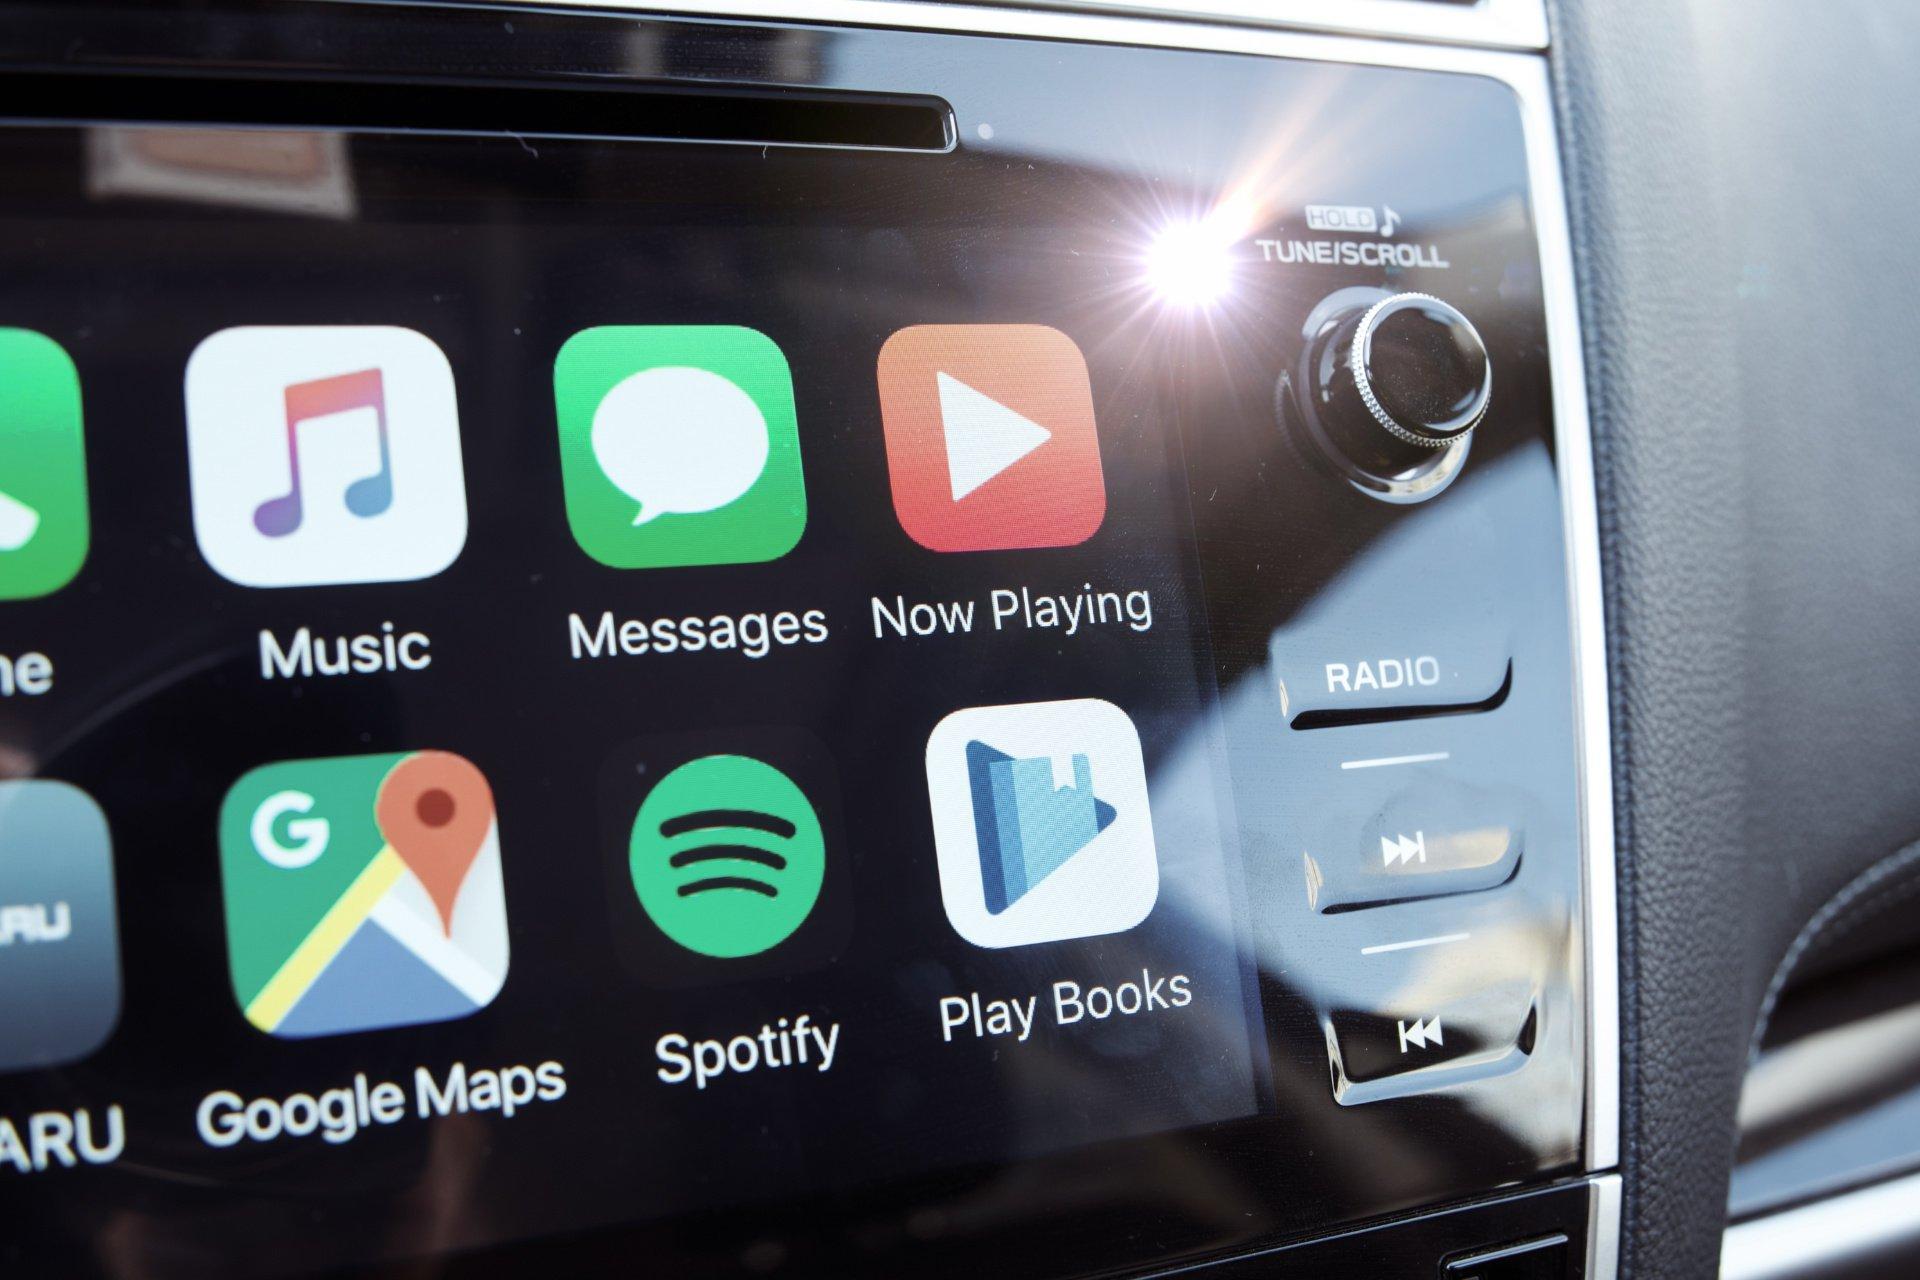 как выглядит YouTube music на экране CarPlay android auto